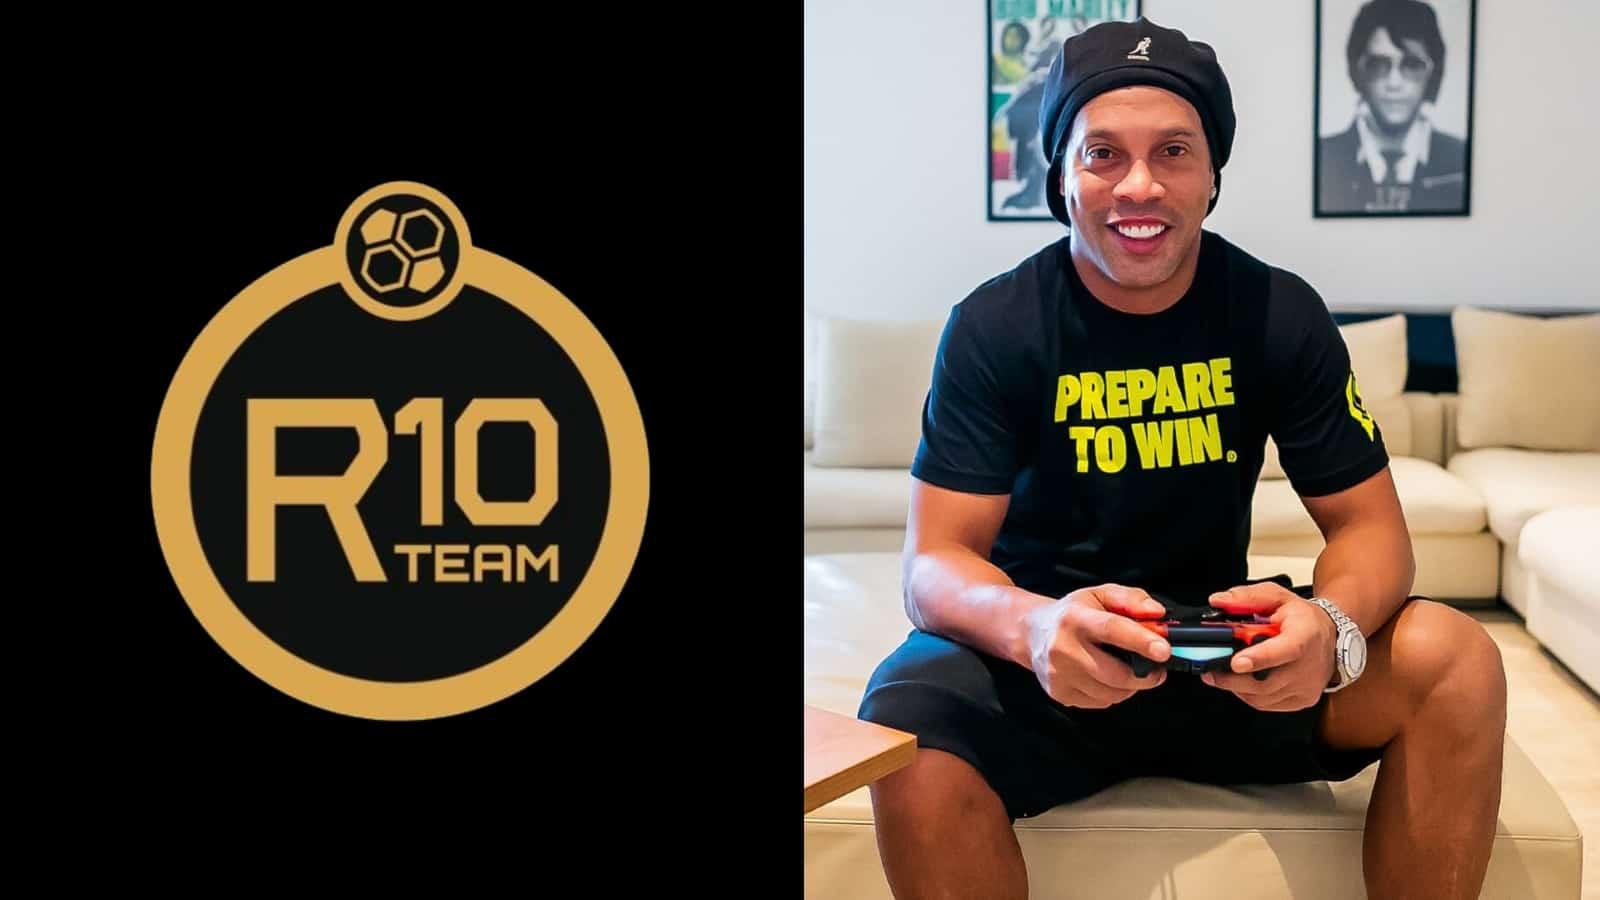 "Ronaldinho created the ""R10 Team"" franchise back in 2019"